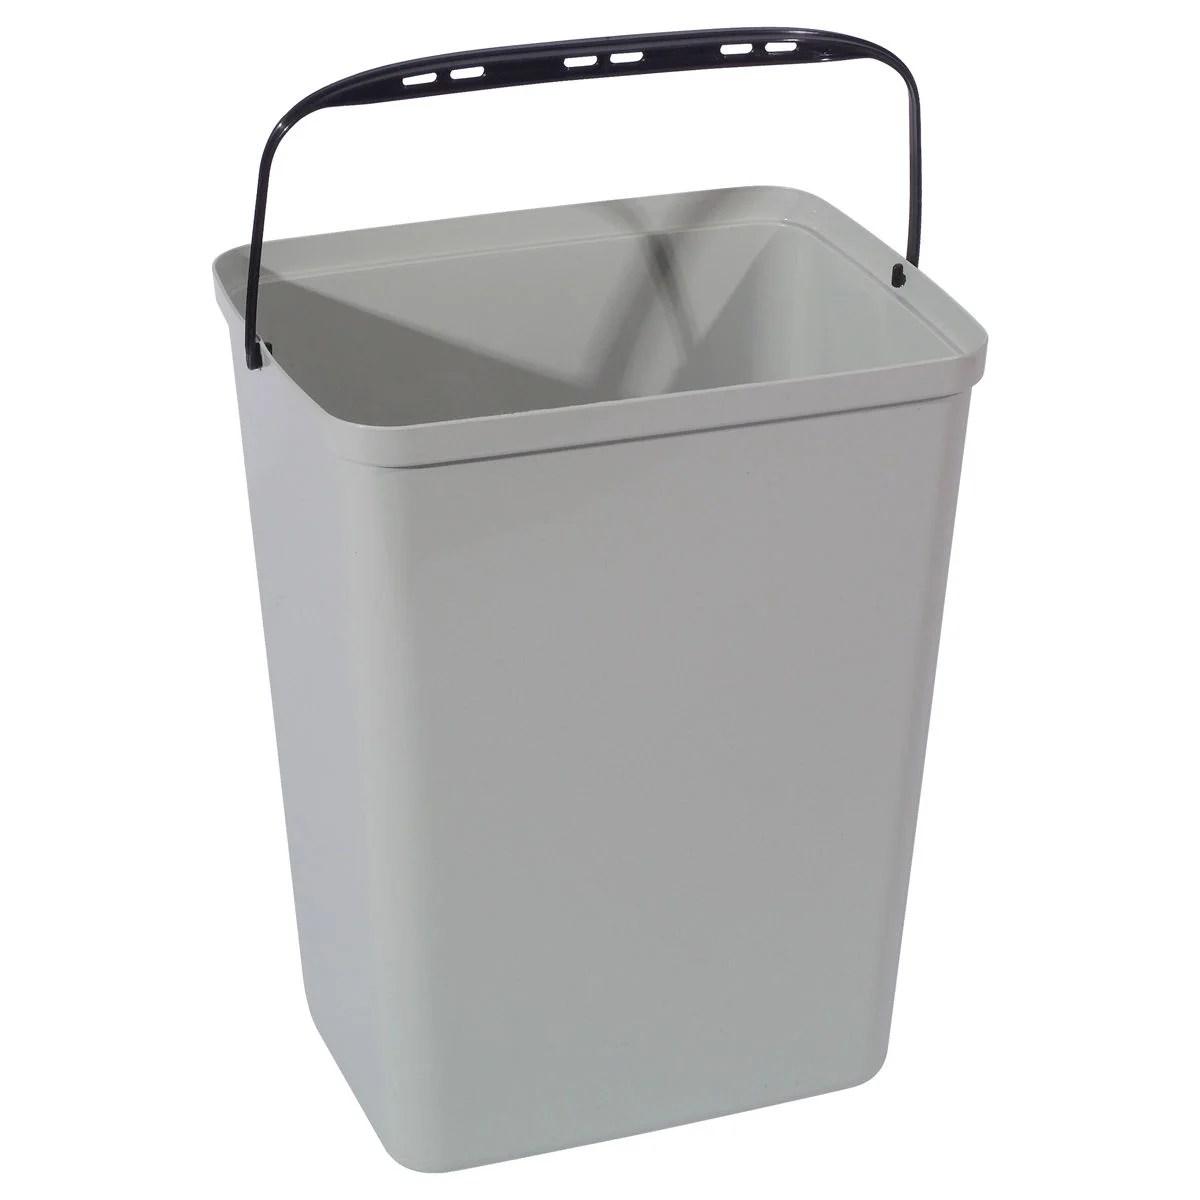 Kit de cuatro cubos para reciclaje  Disset Odiseo